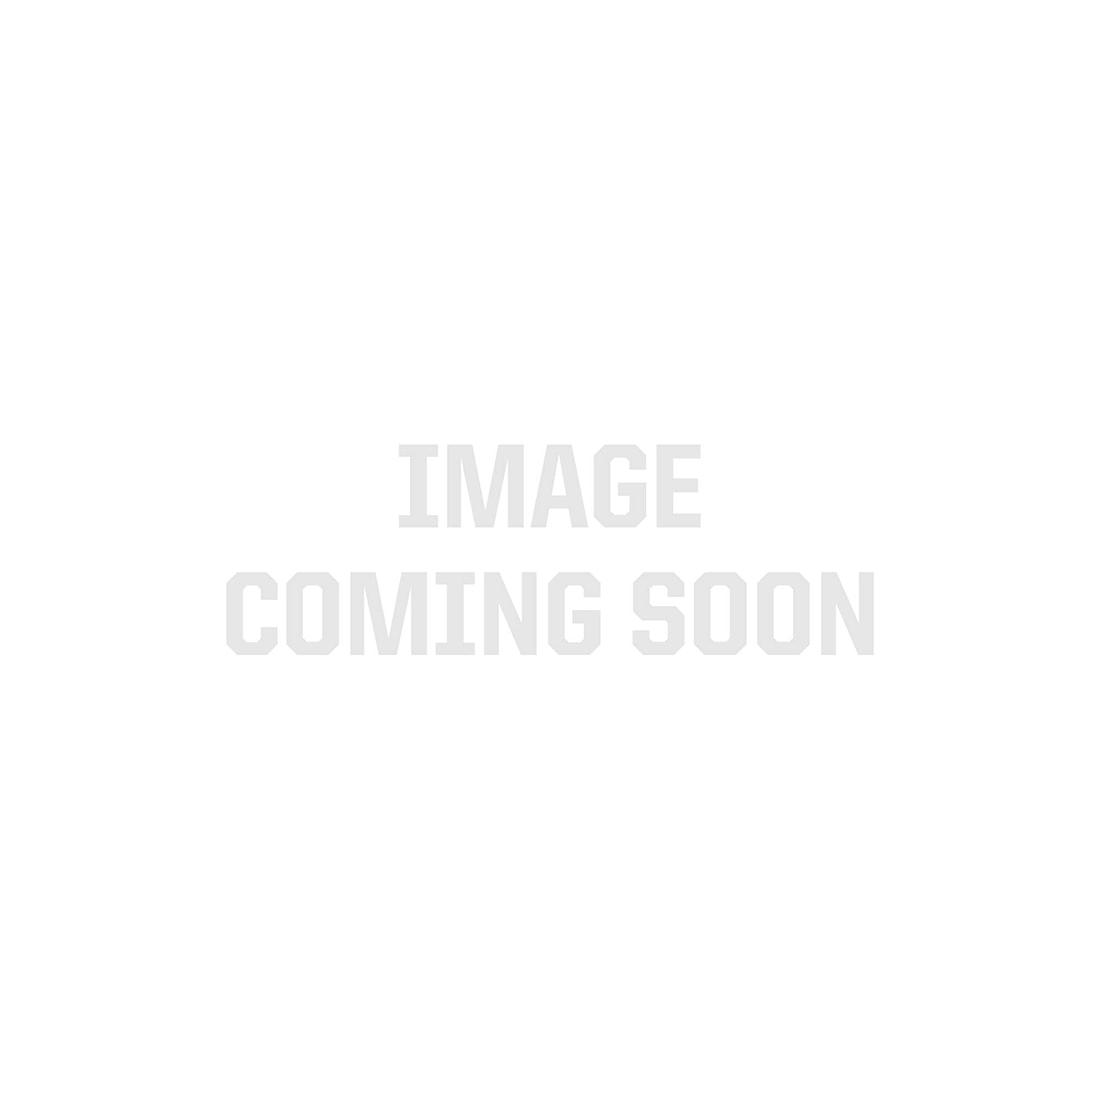 MaxLite MaxLED full cutoff LED Wall Pack (Dark Sky), 69 Watts Bronze or White